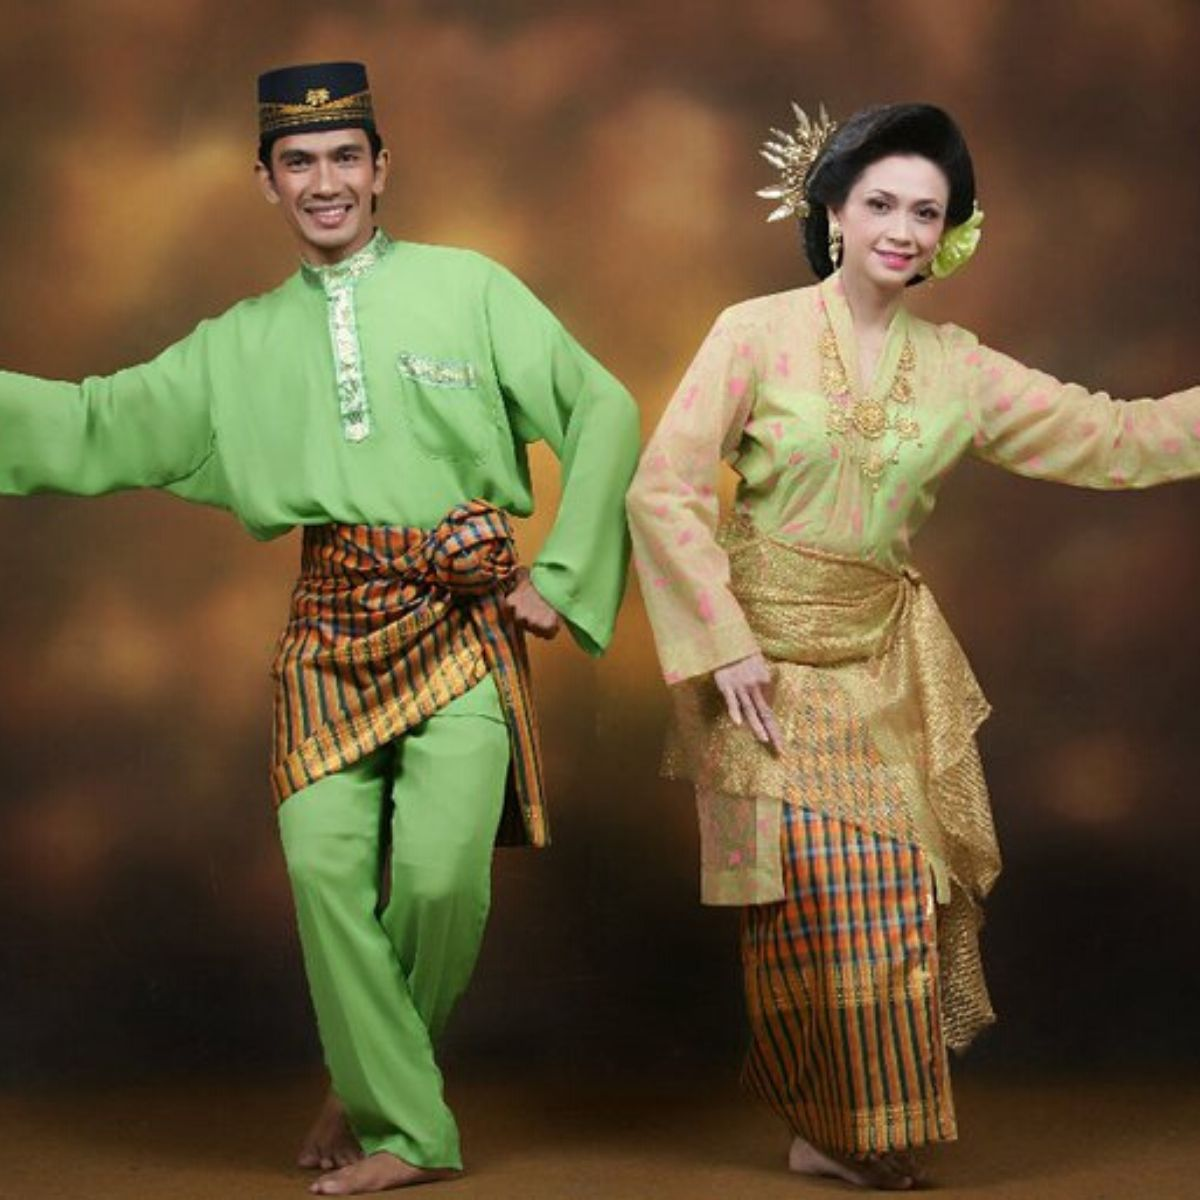 Daftar  Nama Pakaian Adat Riau Modern, Filosofi Pakaian